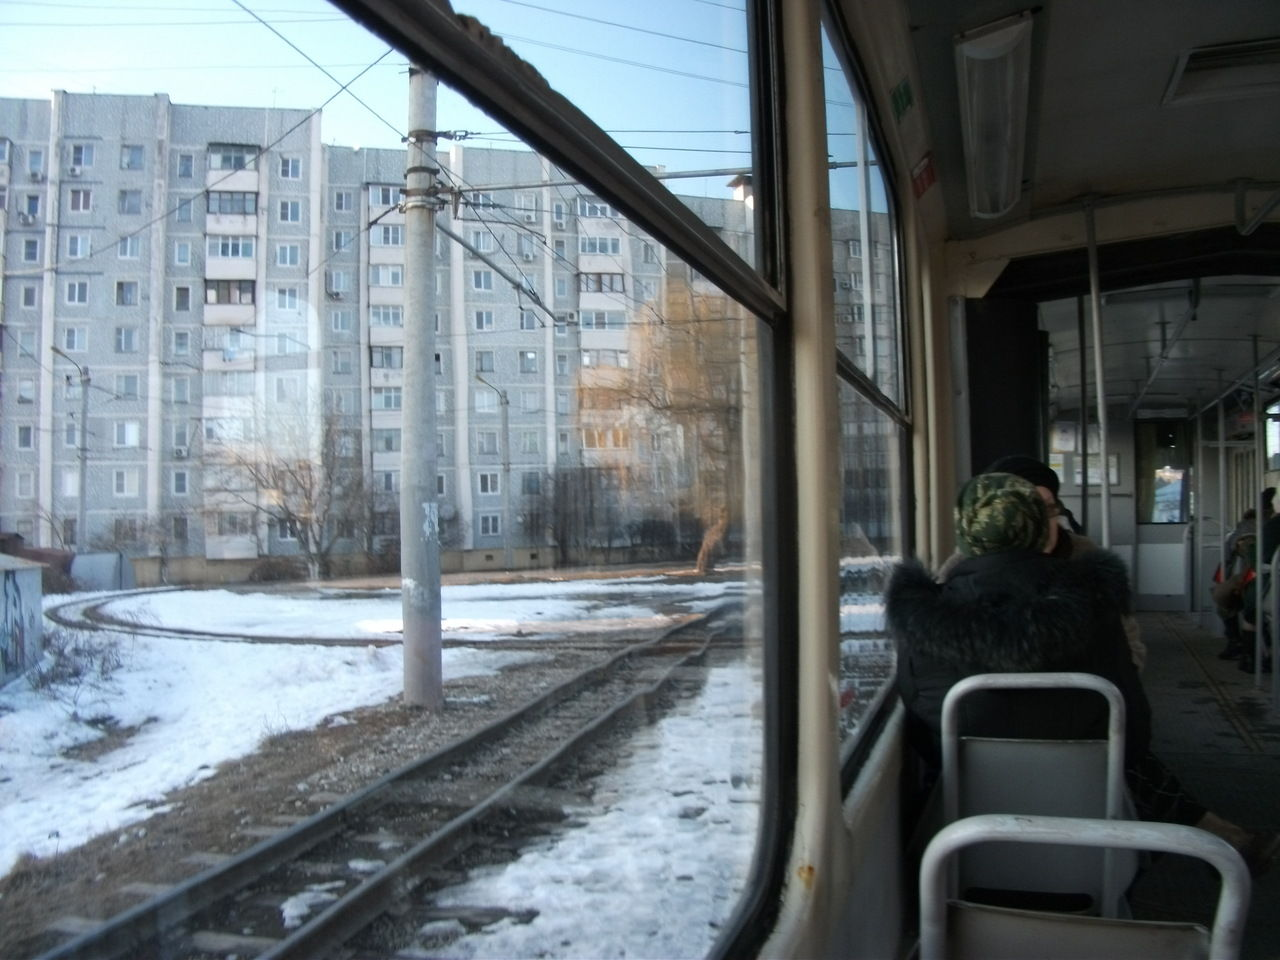 ВПятигорске безбилетник убежал изтрамвая, разбив окно